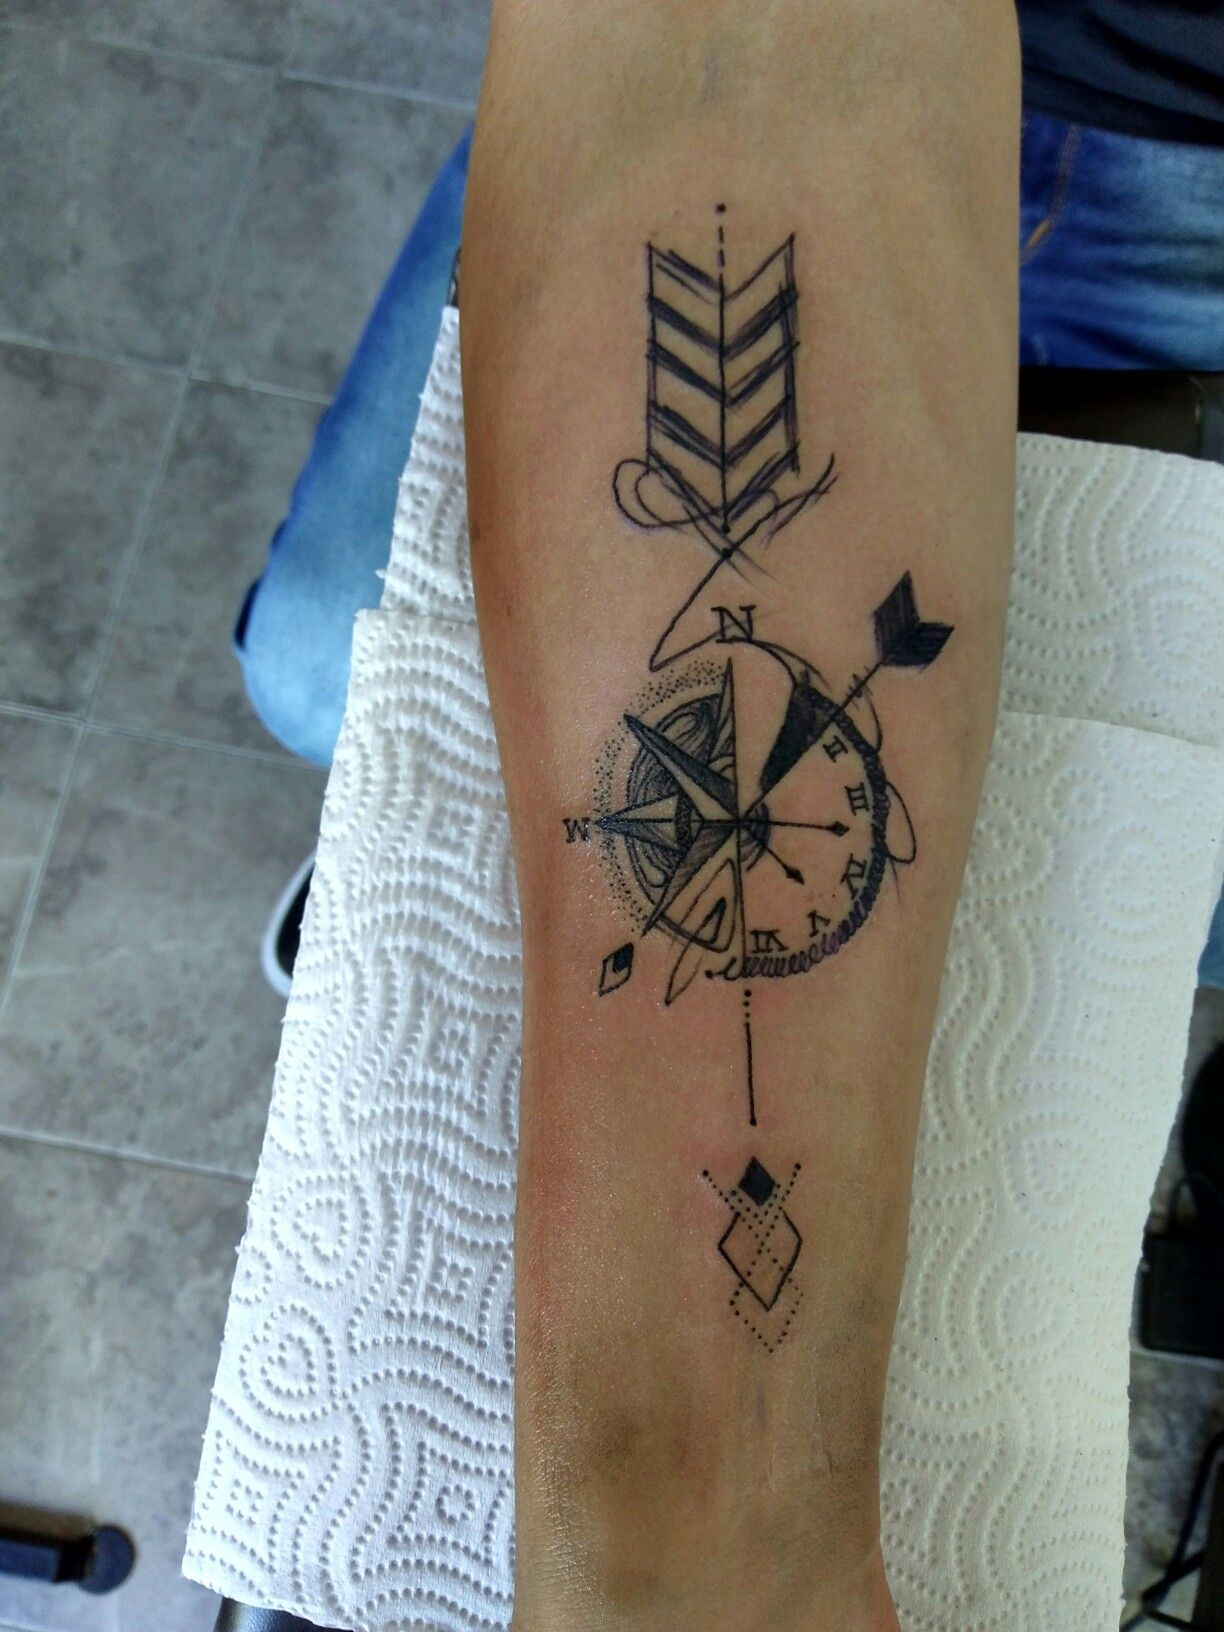 Tattoo Flecha Rosa De Los Vientos Rosa De Los Vientos Tatuajes Tatuajes Para Hombres